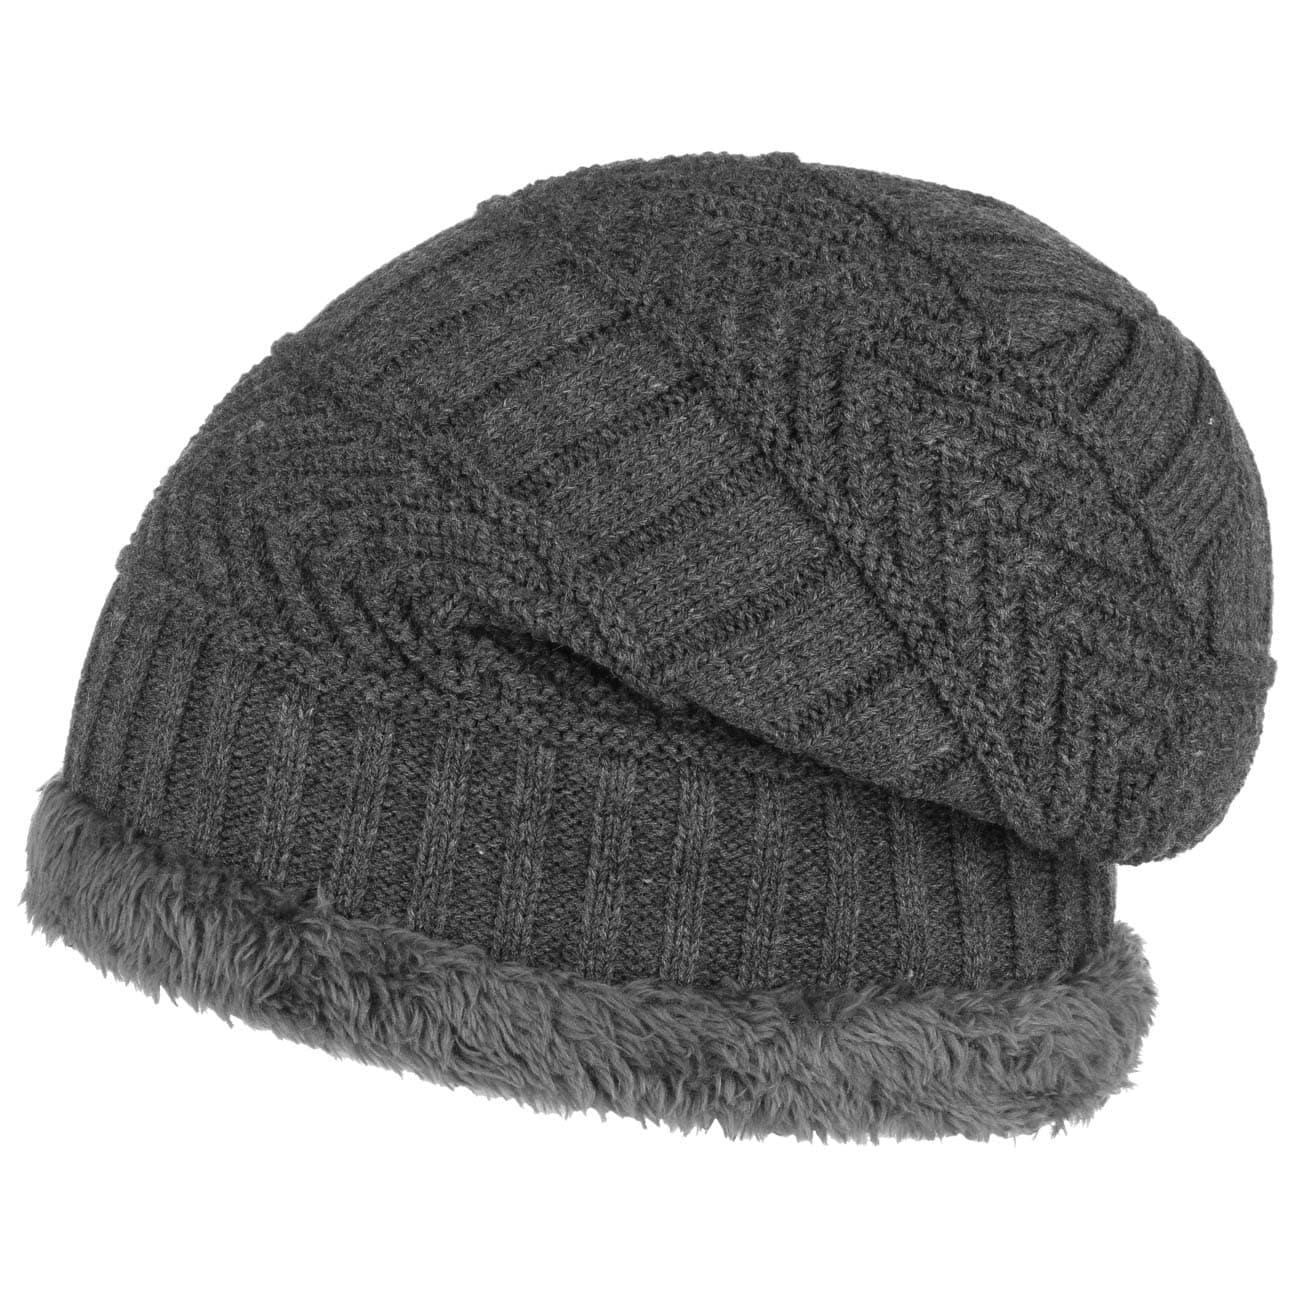 Bonnet Beanie avec Peluche by Lipodo  bonnet